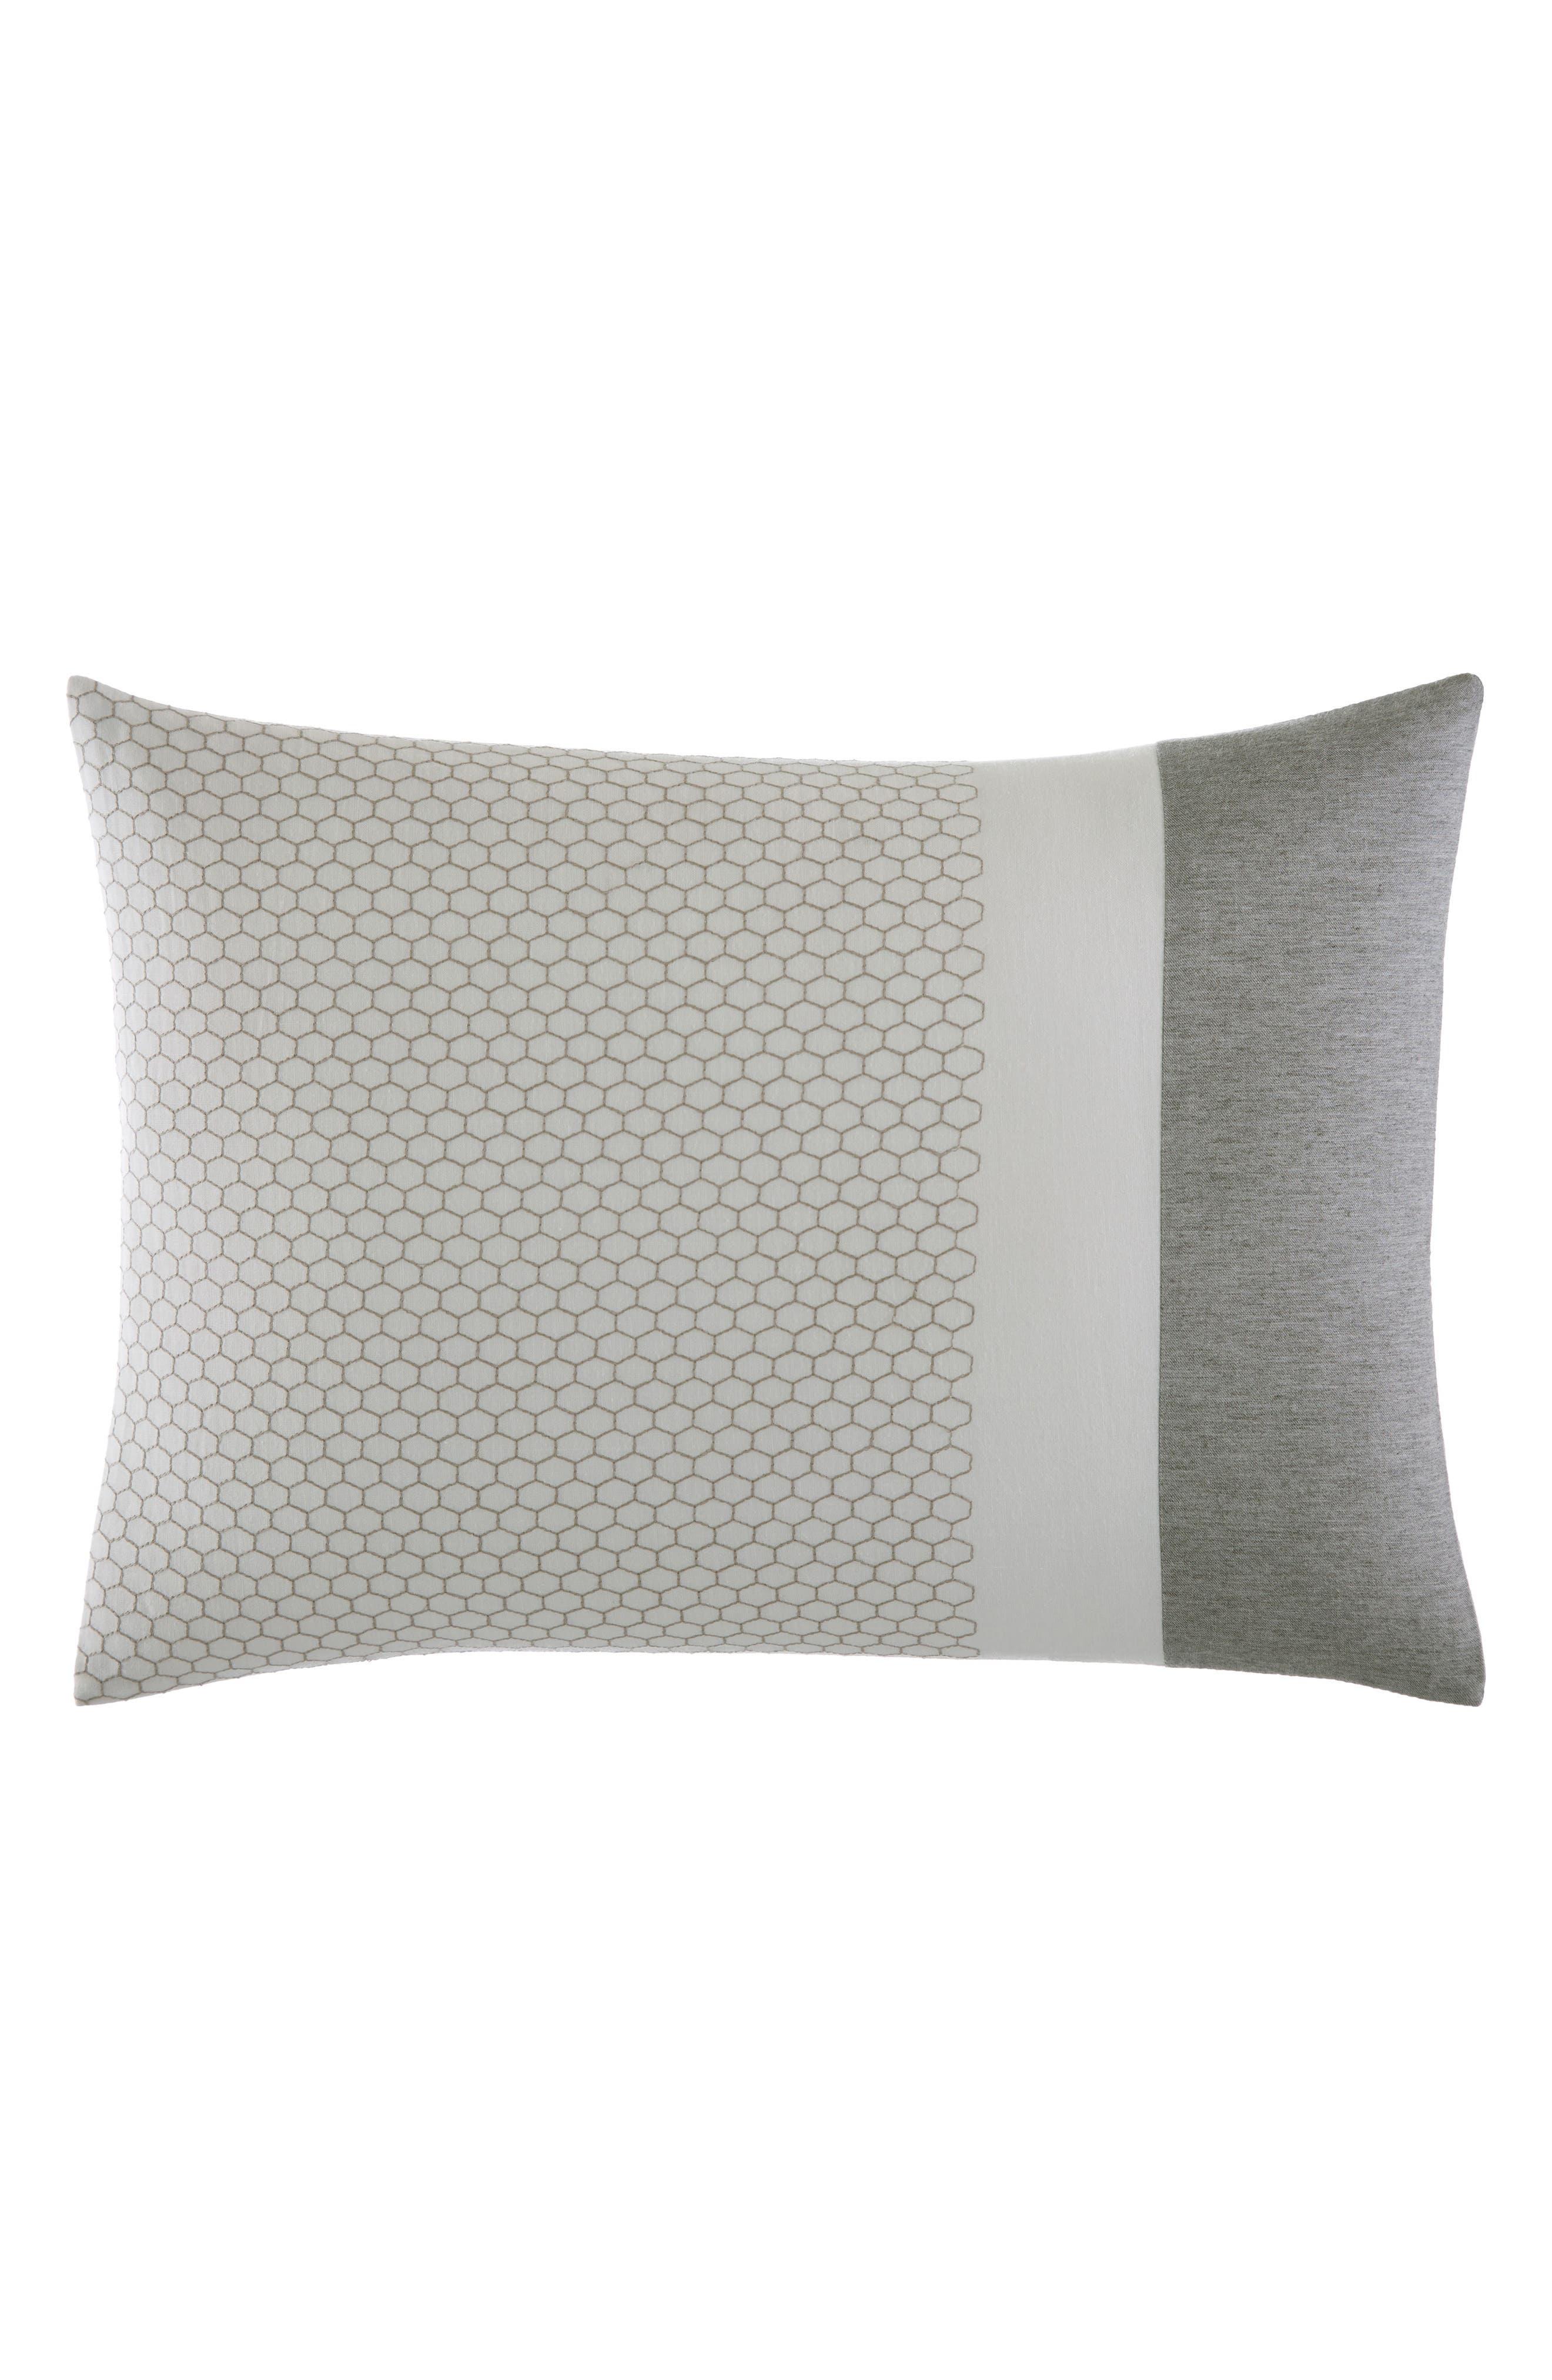 Tuille Floral Breakfast Pillow,                             Main thumbnail 1, color,                             MEDIUM GRAY